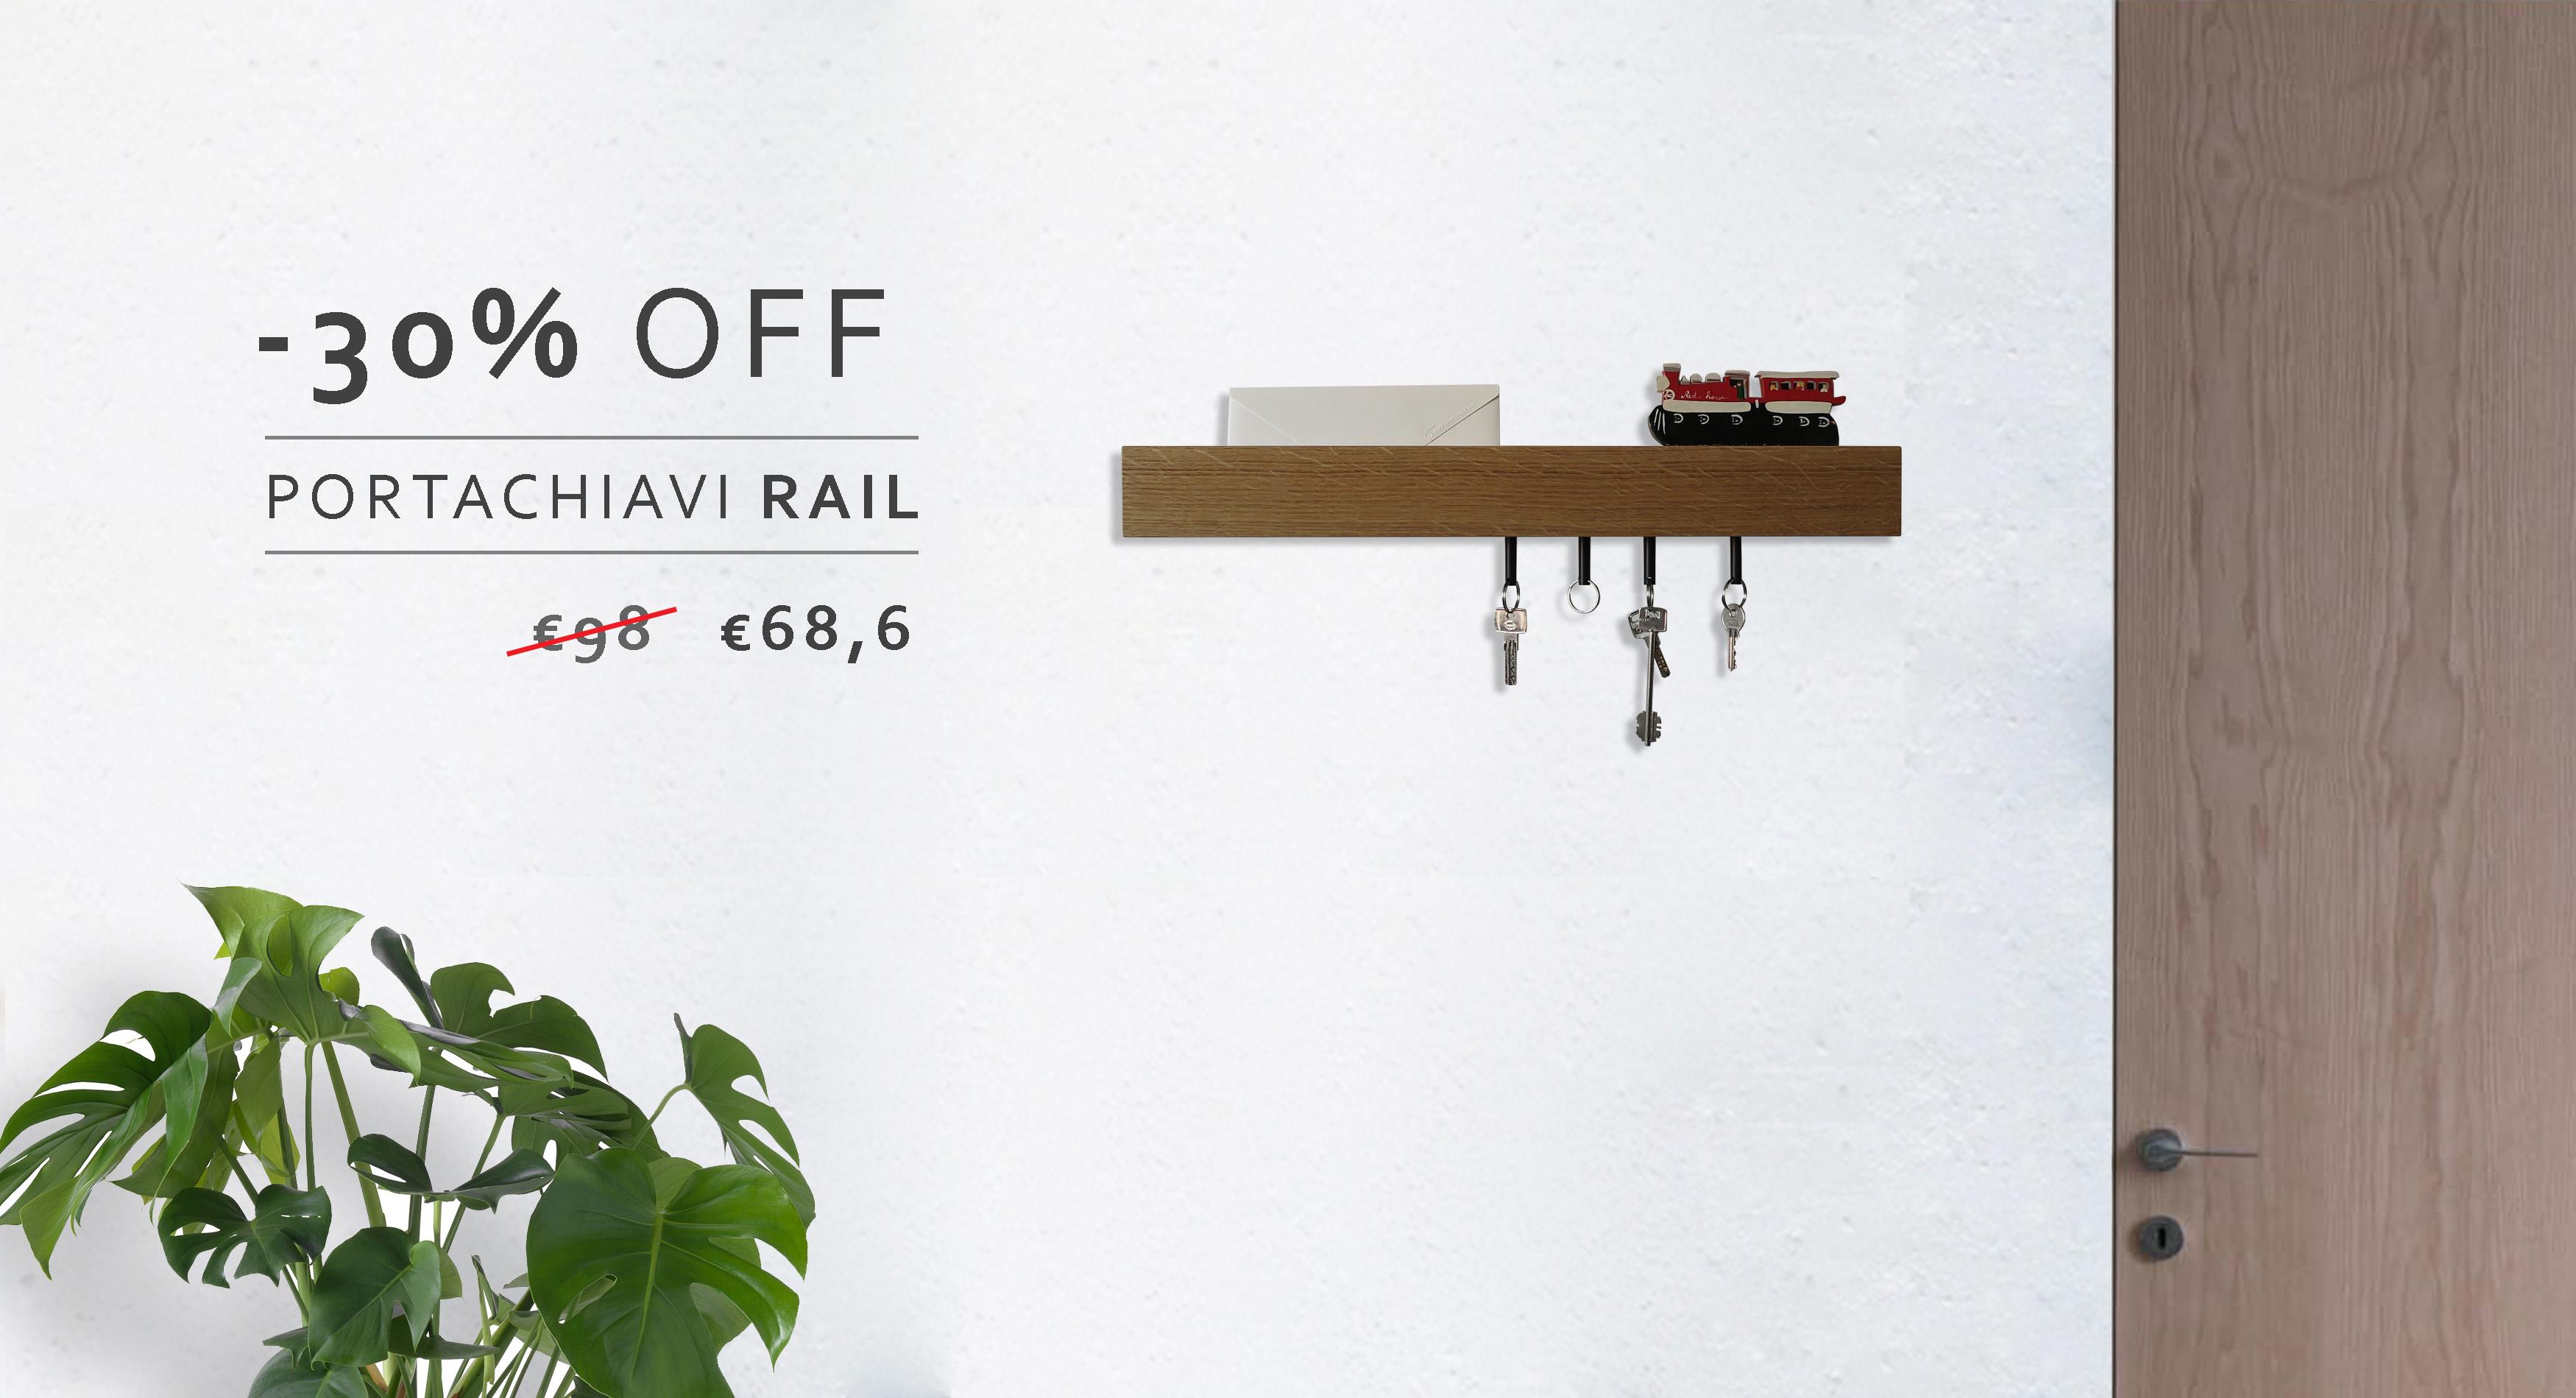 portachiavi-muro-design-wall-key-holder-designobject